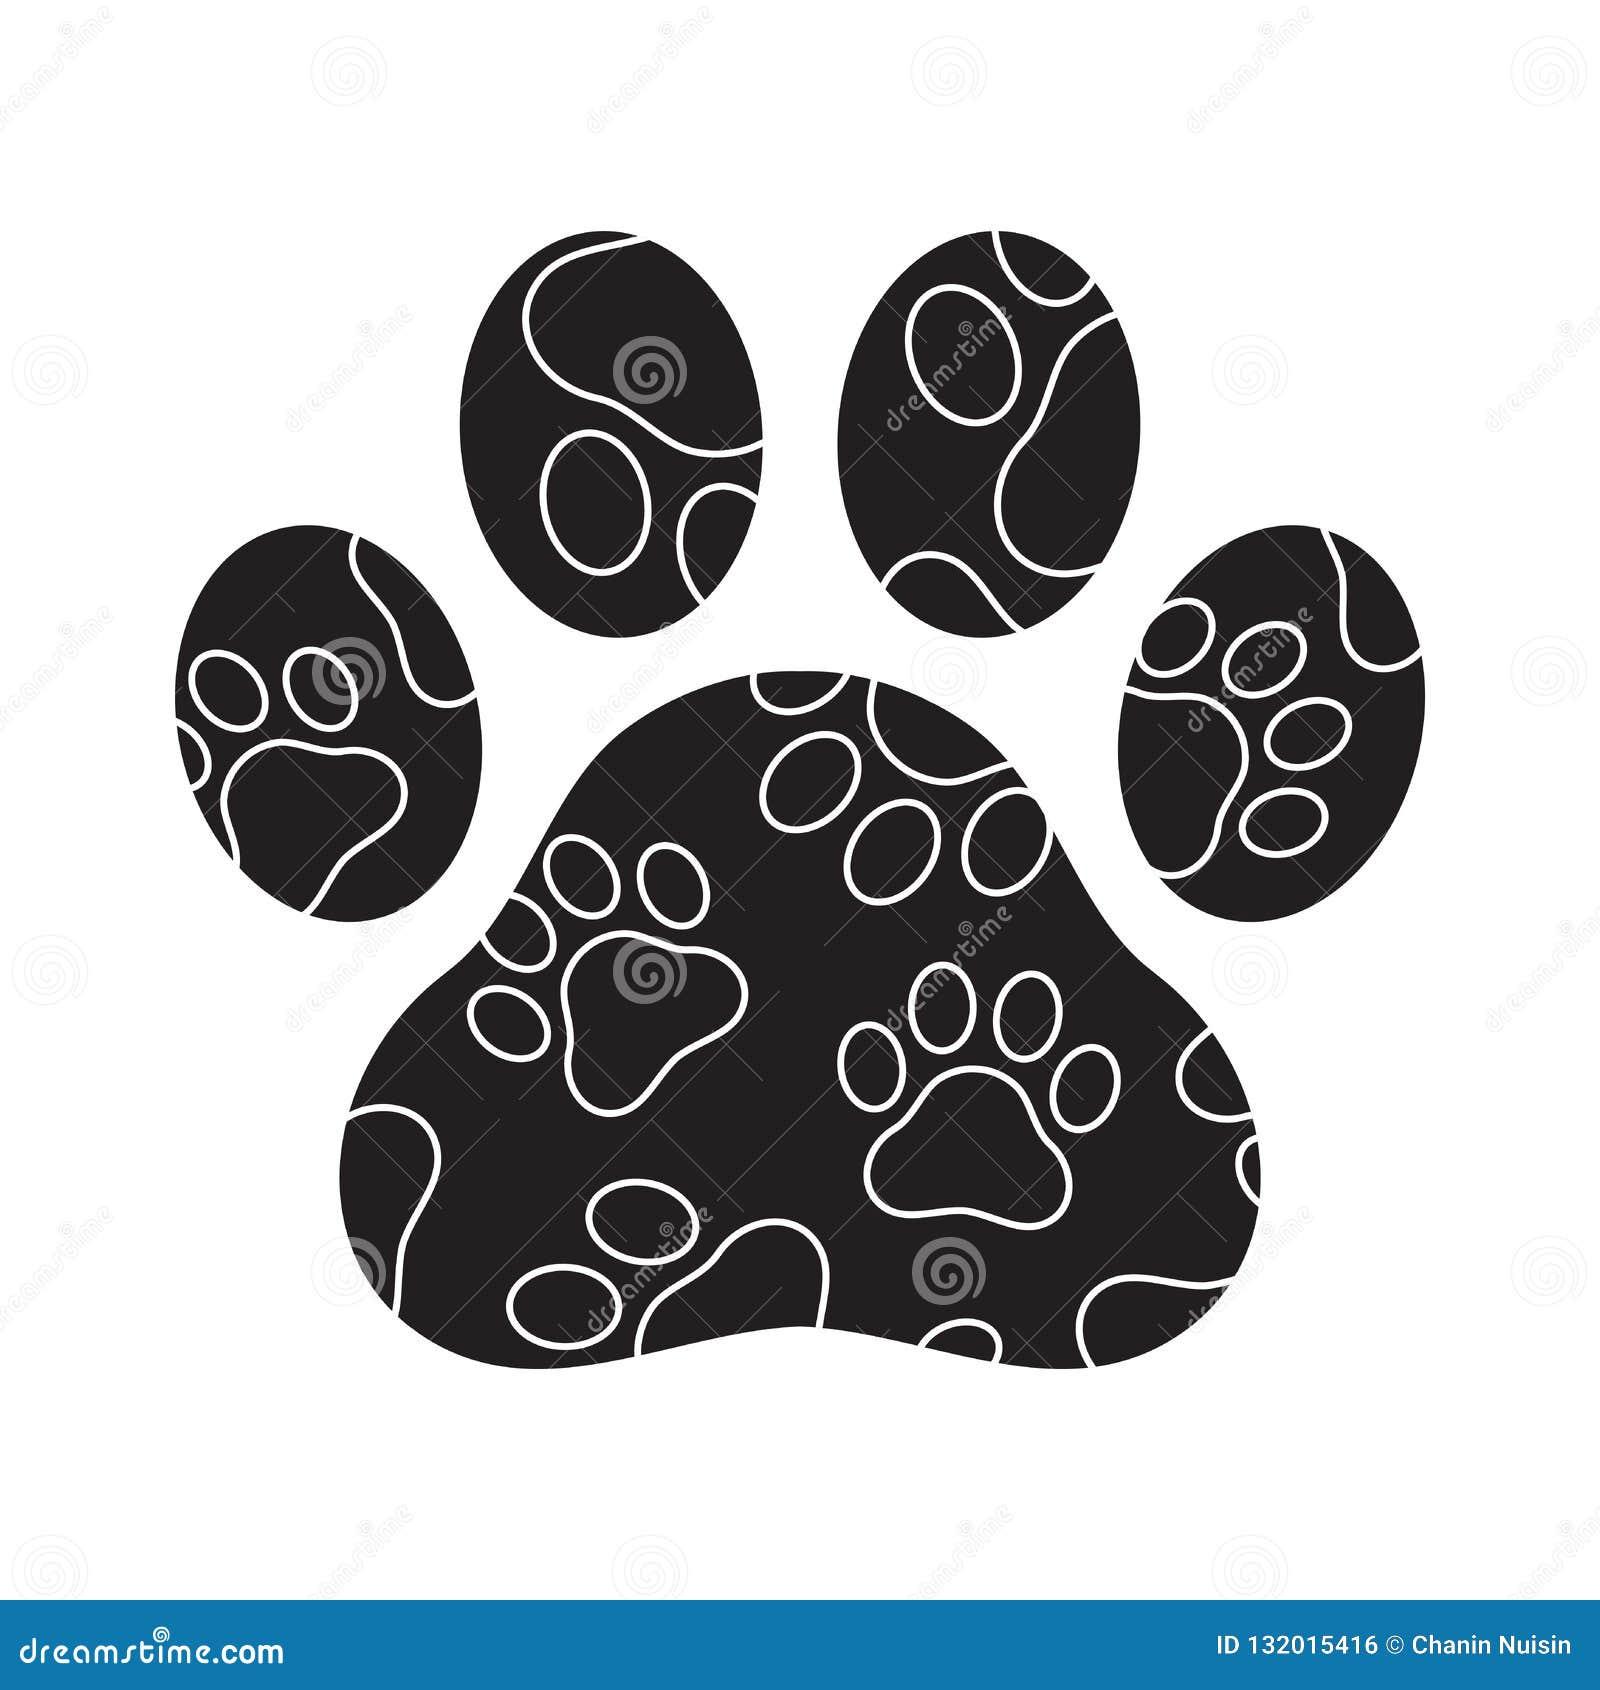 Dog paw vector footprint logo icon camouflage graphic symbol illustration french bulldog bear cat cartoon